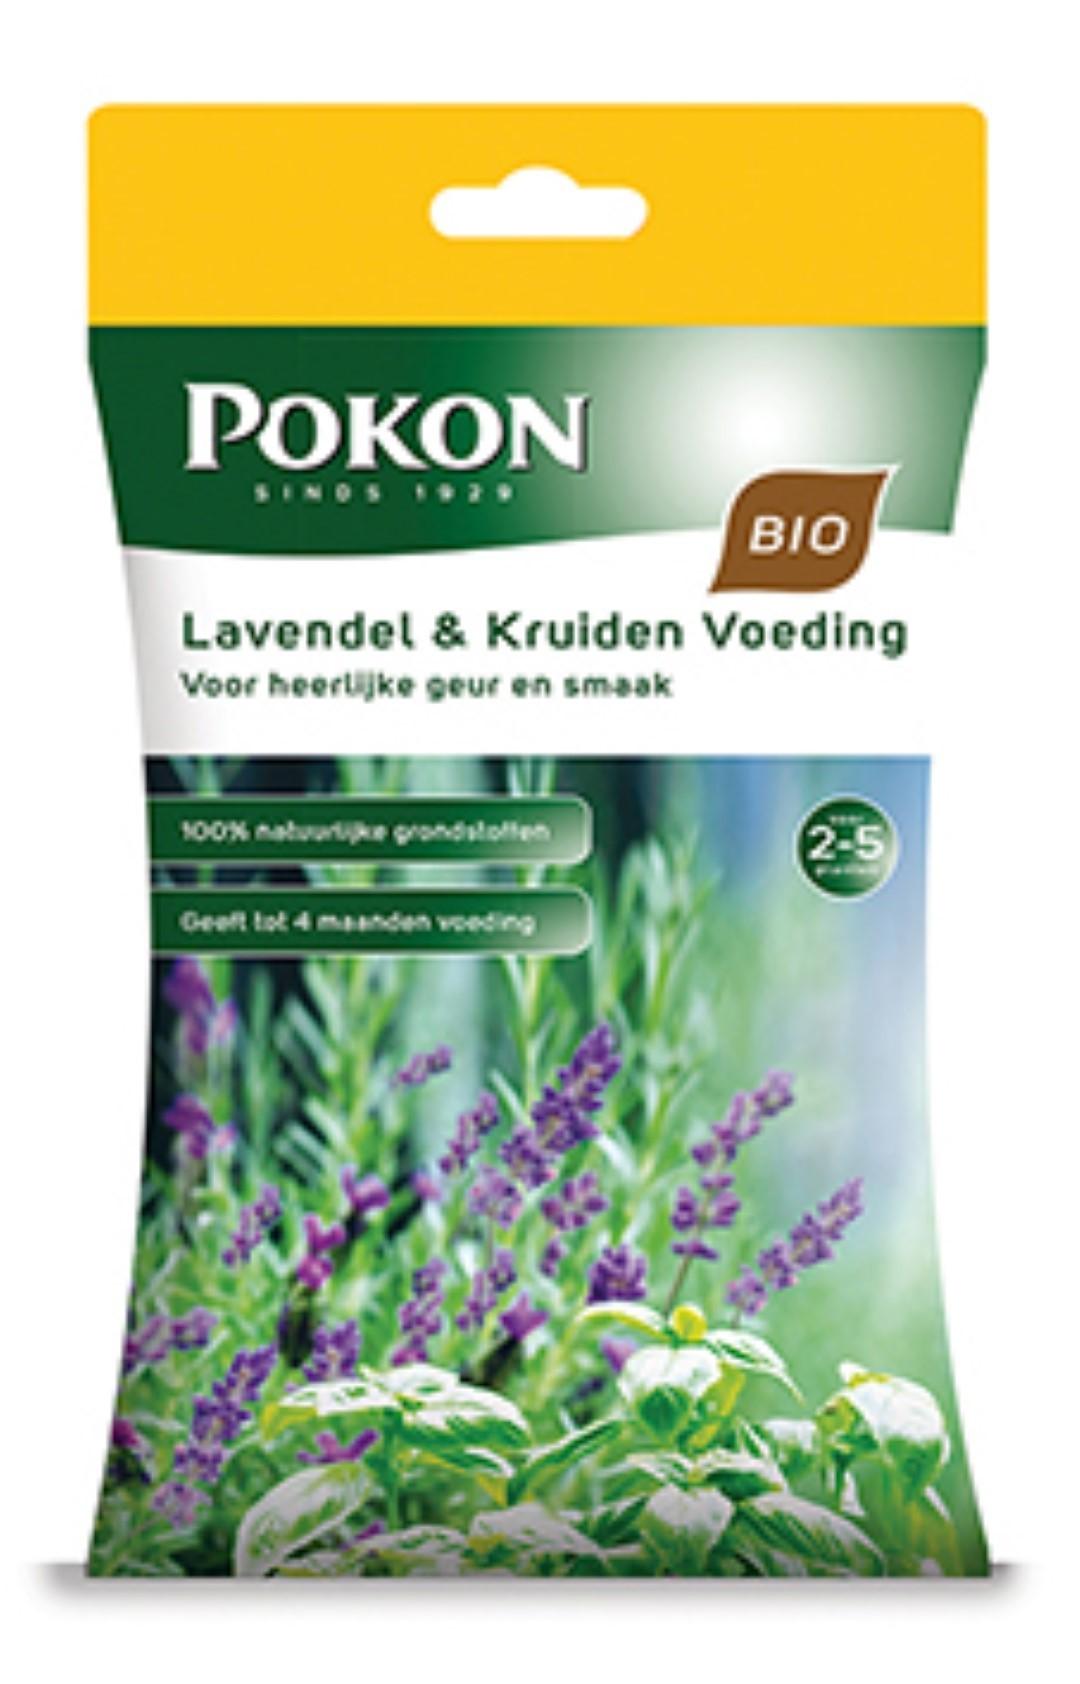 Lavendel & Kruiden Voeding 100gr